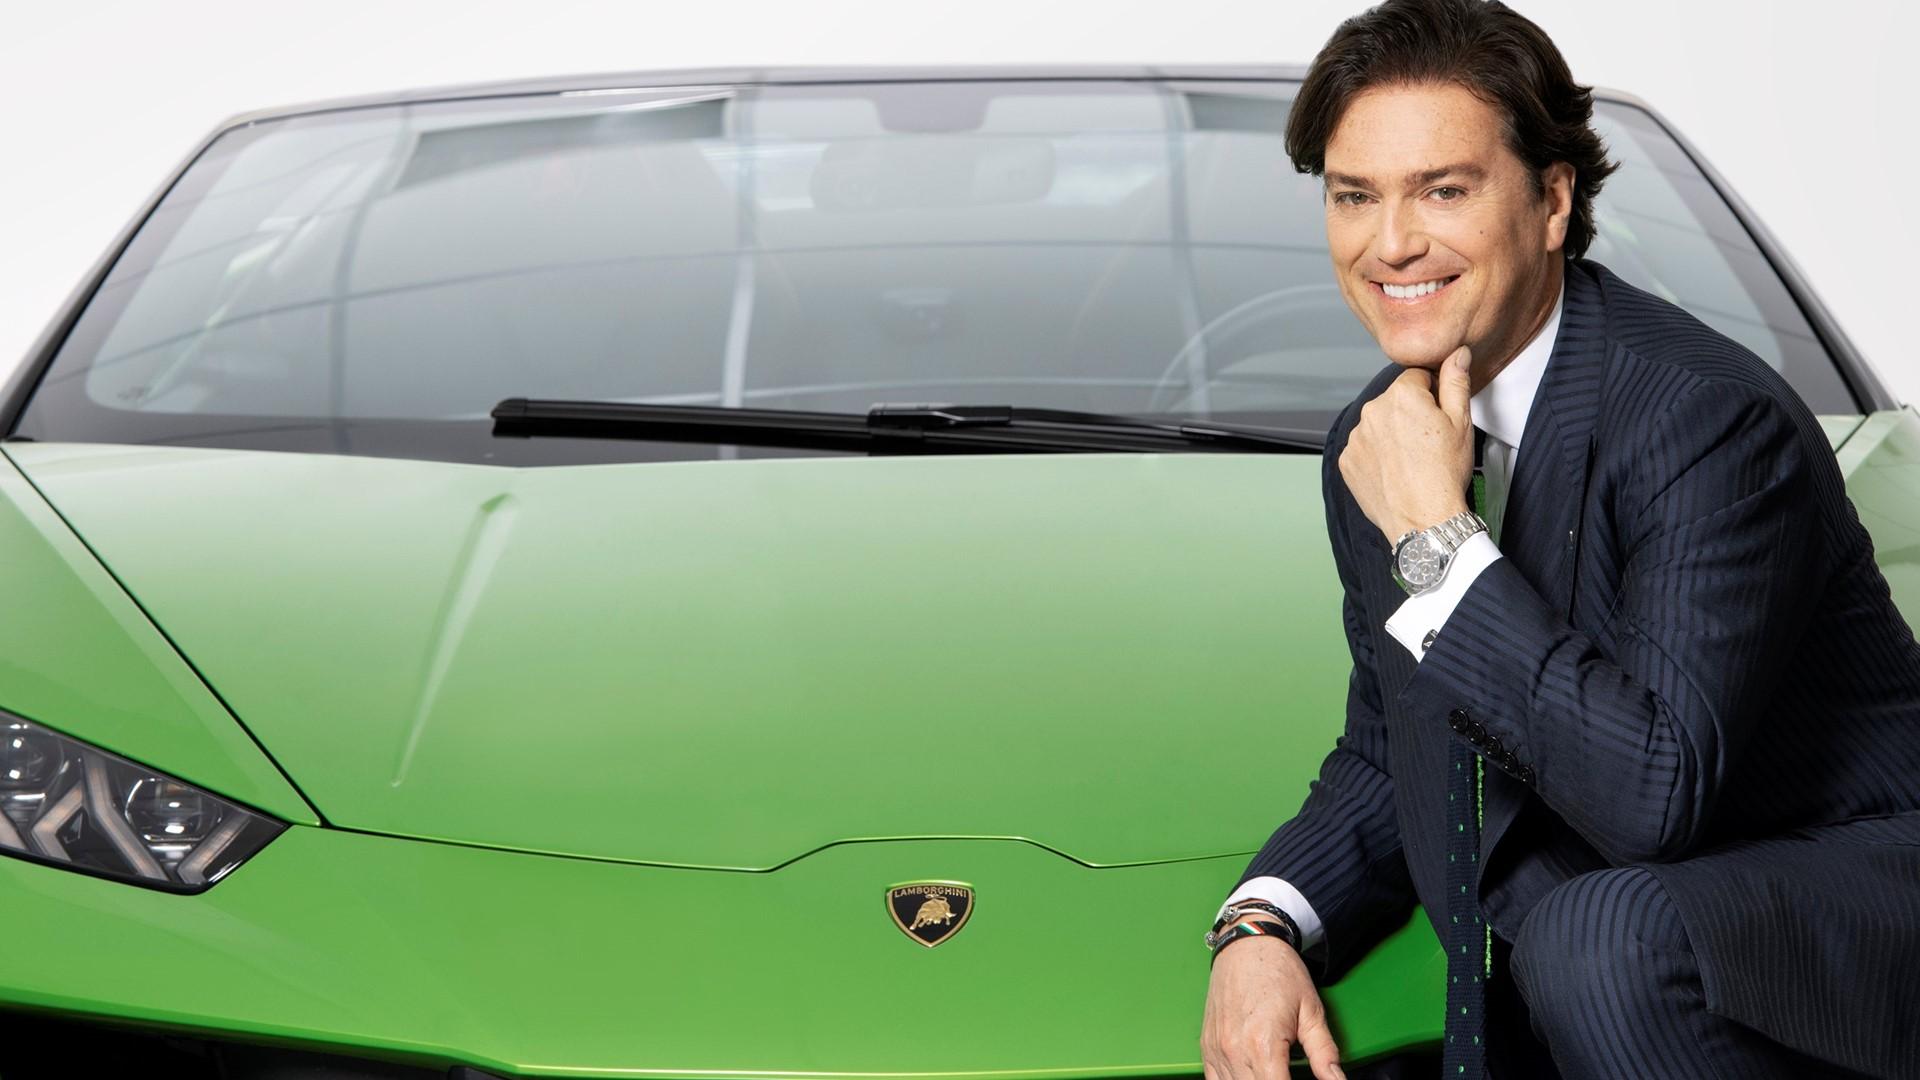 Automobili Lamborghini makes new Board of Management appointments - Image 1